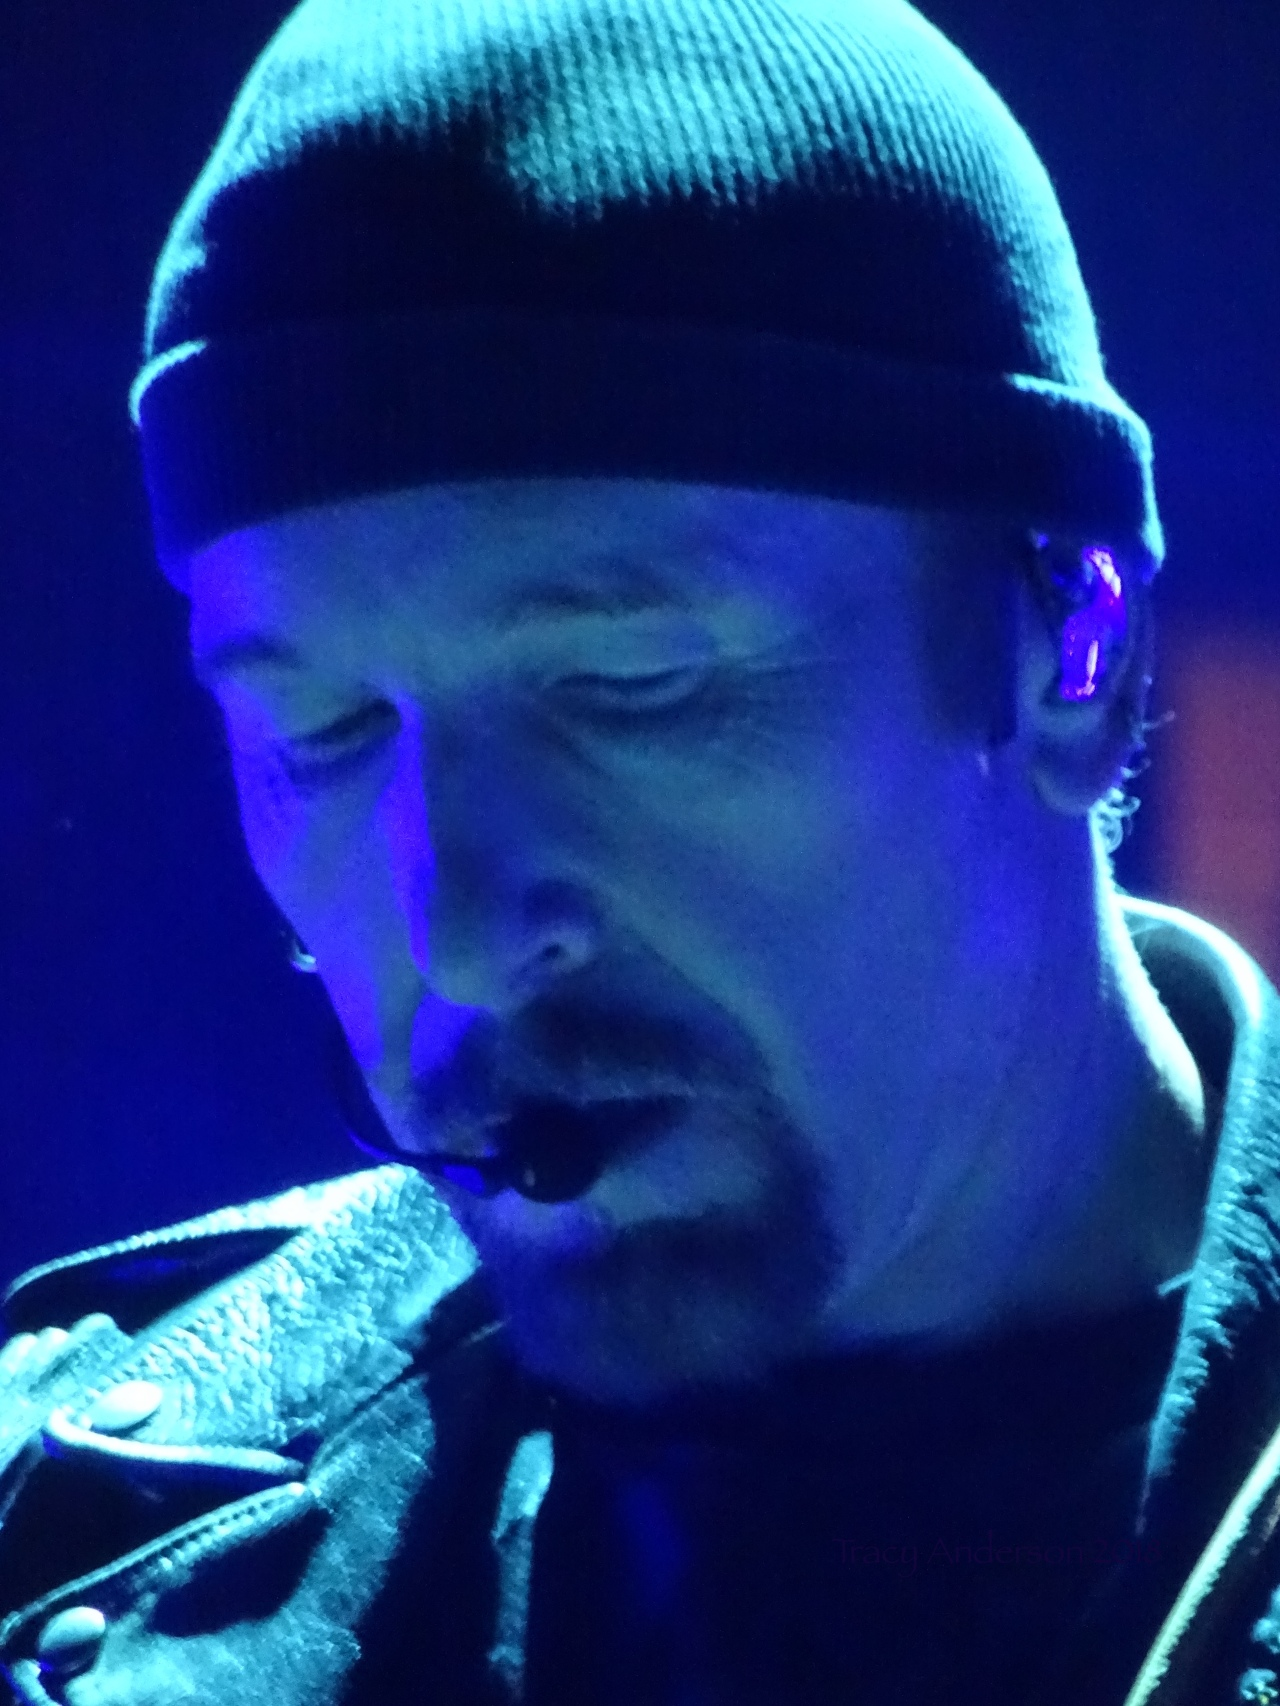 Edge Blue U2 eiTour Las Vegas May 11 2018